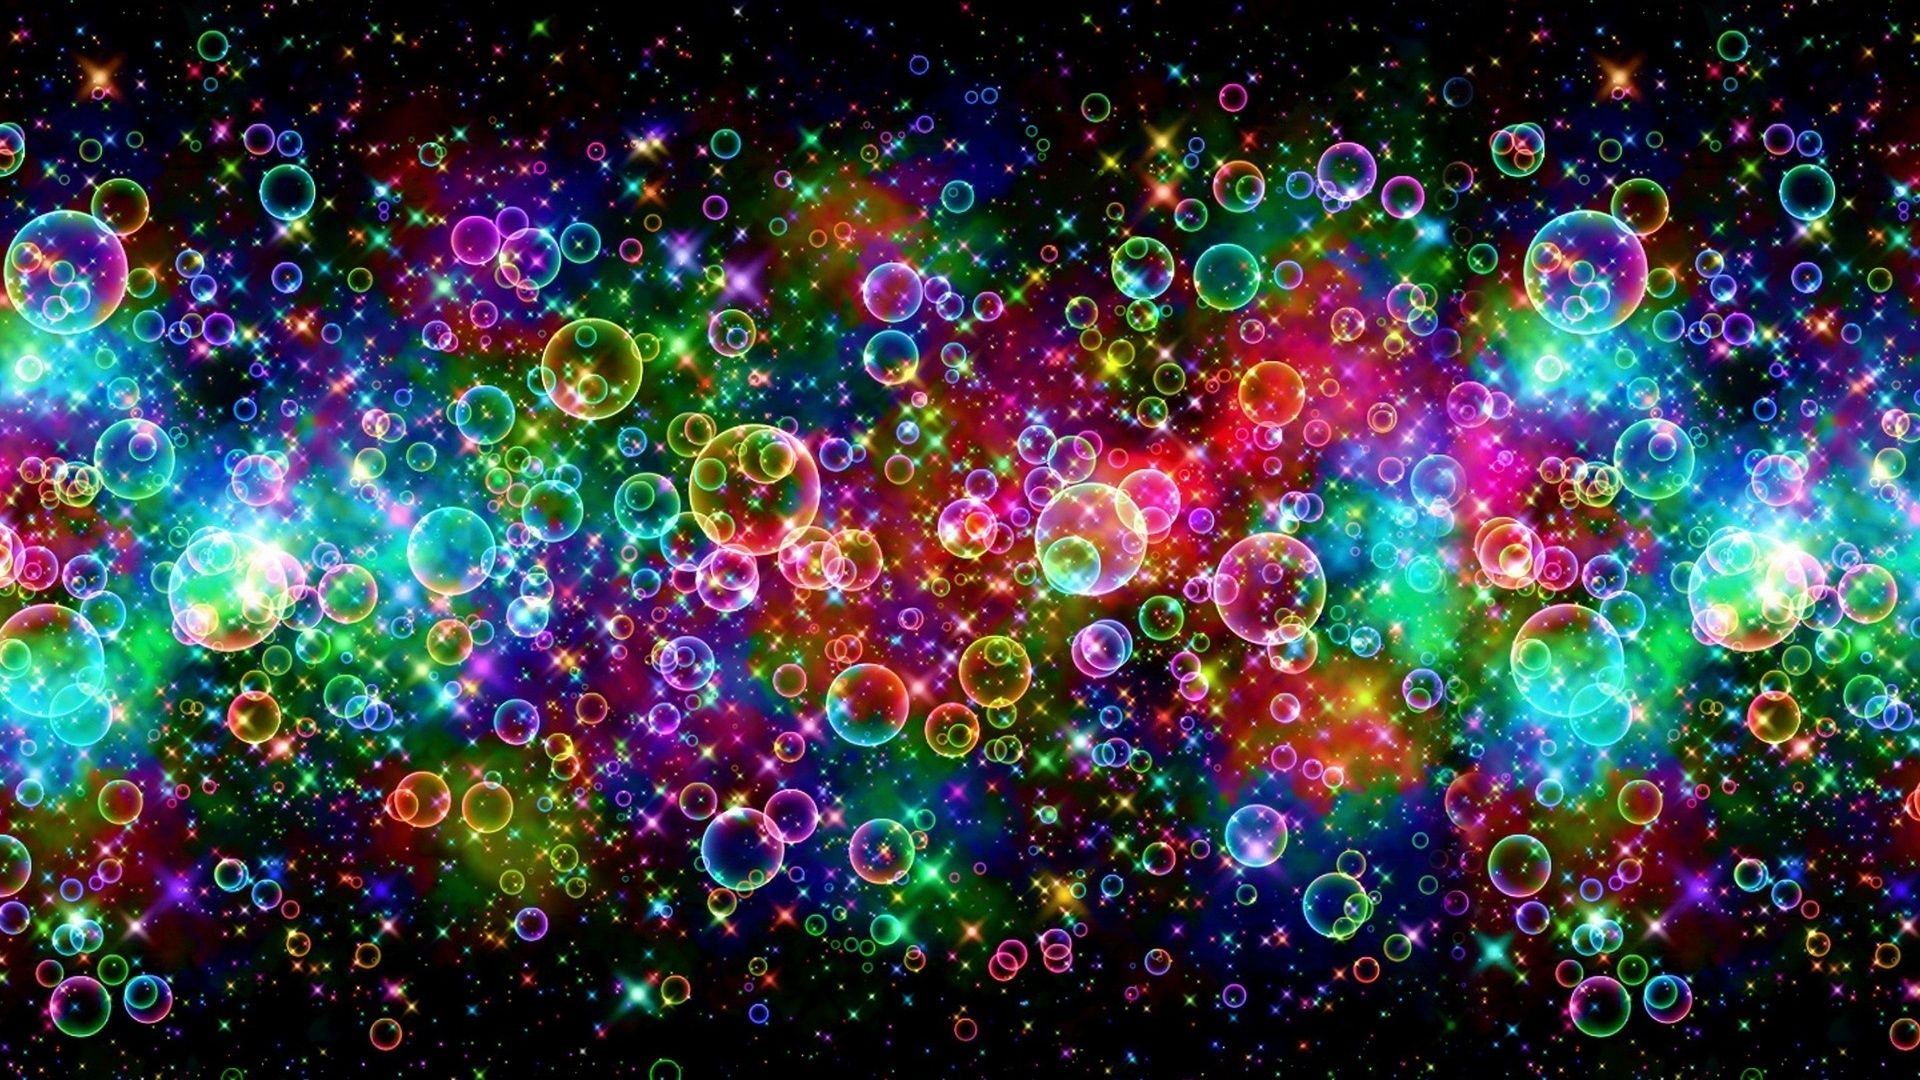 1920x1080 Psychedelic Bubbles desktop PC and Mac wallpaper 1920x1080